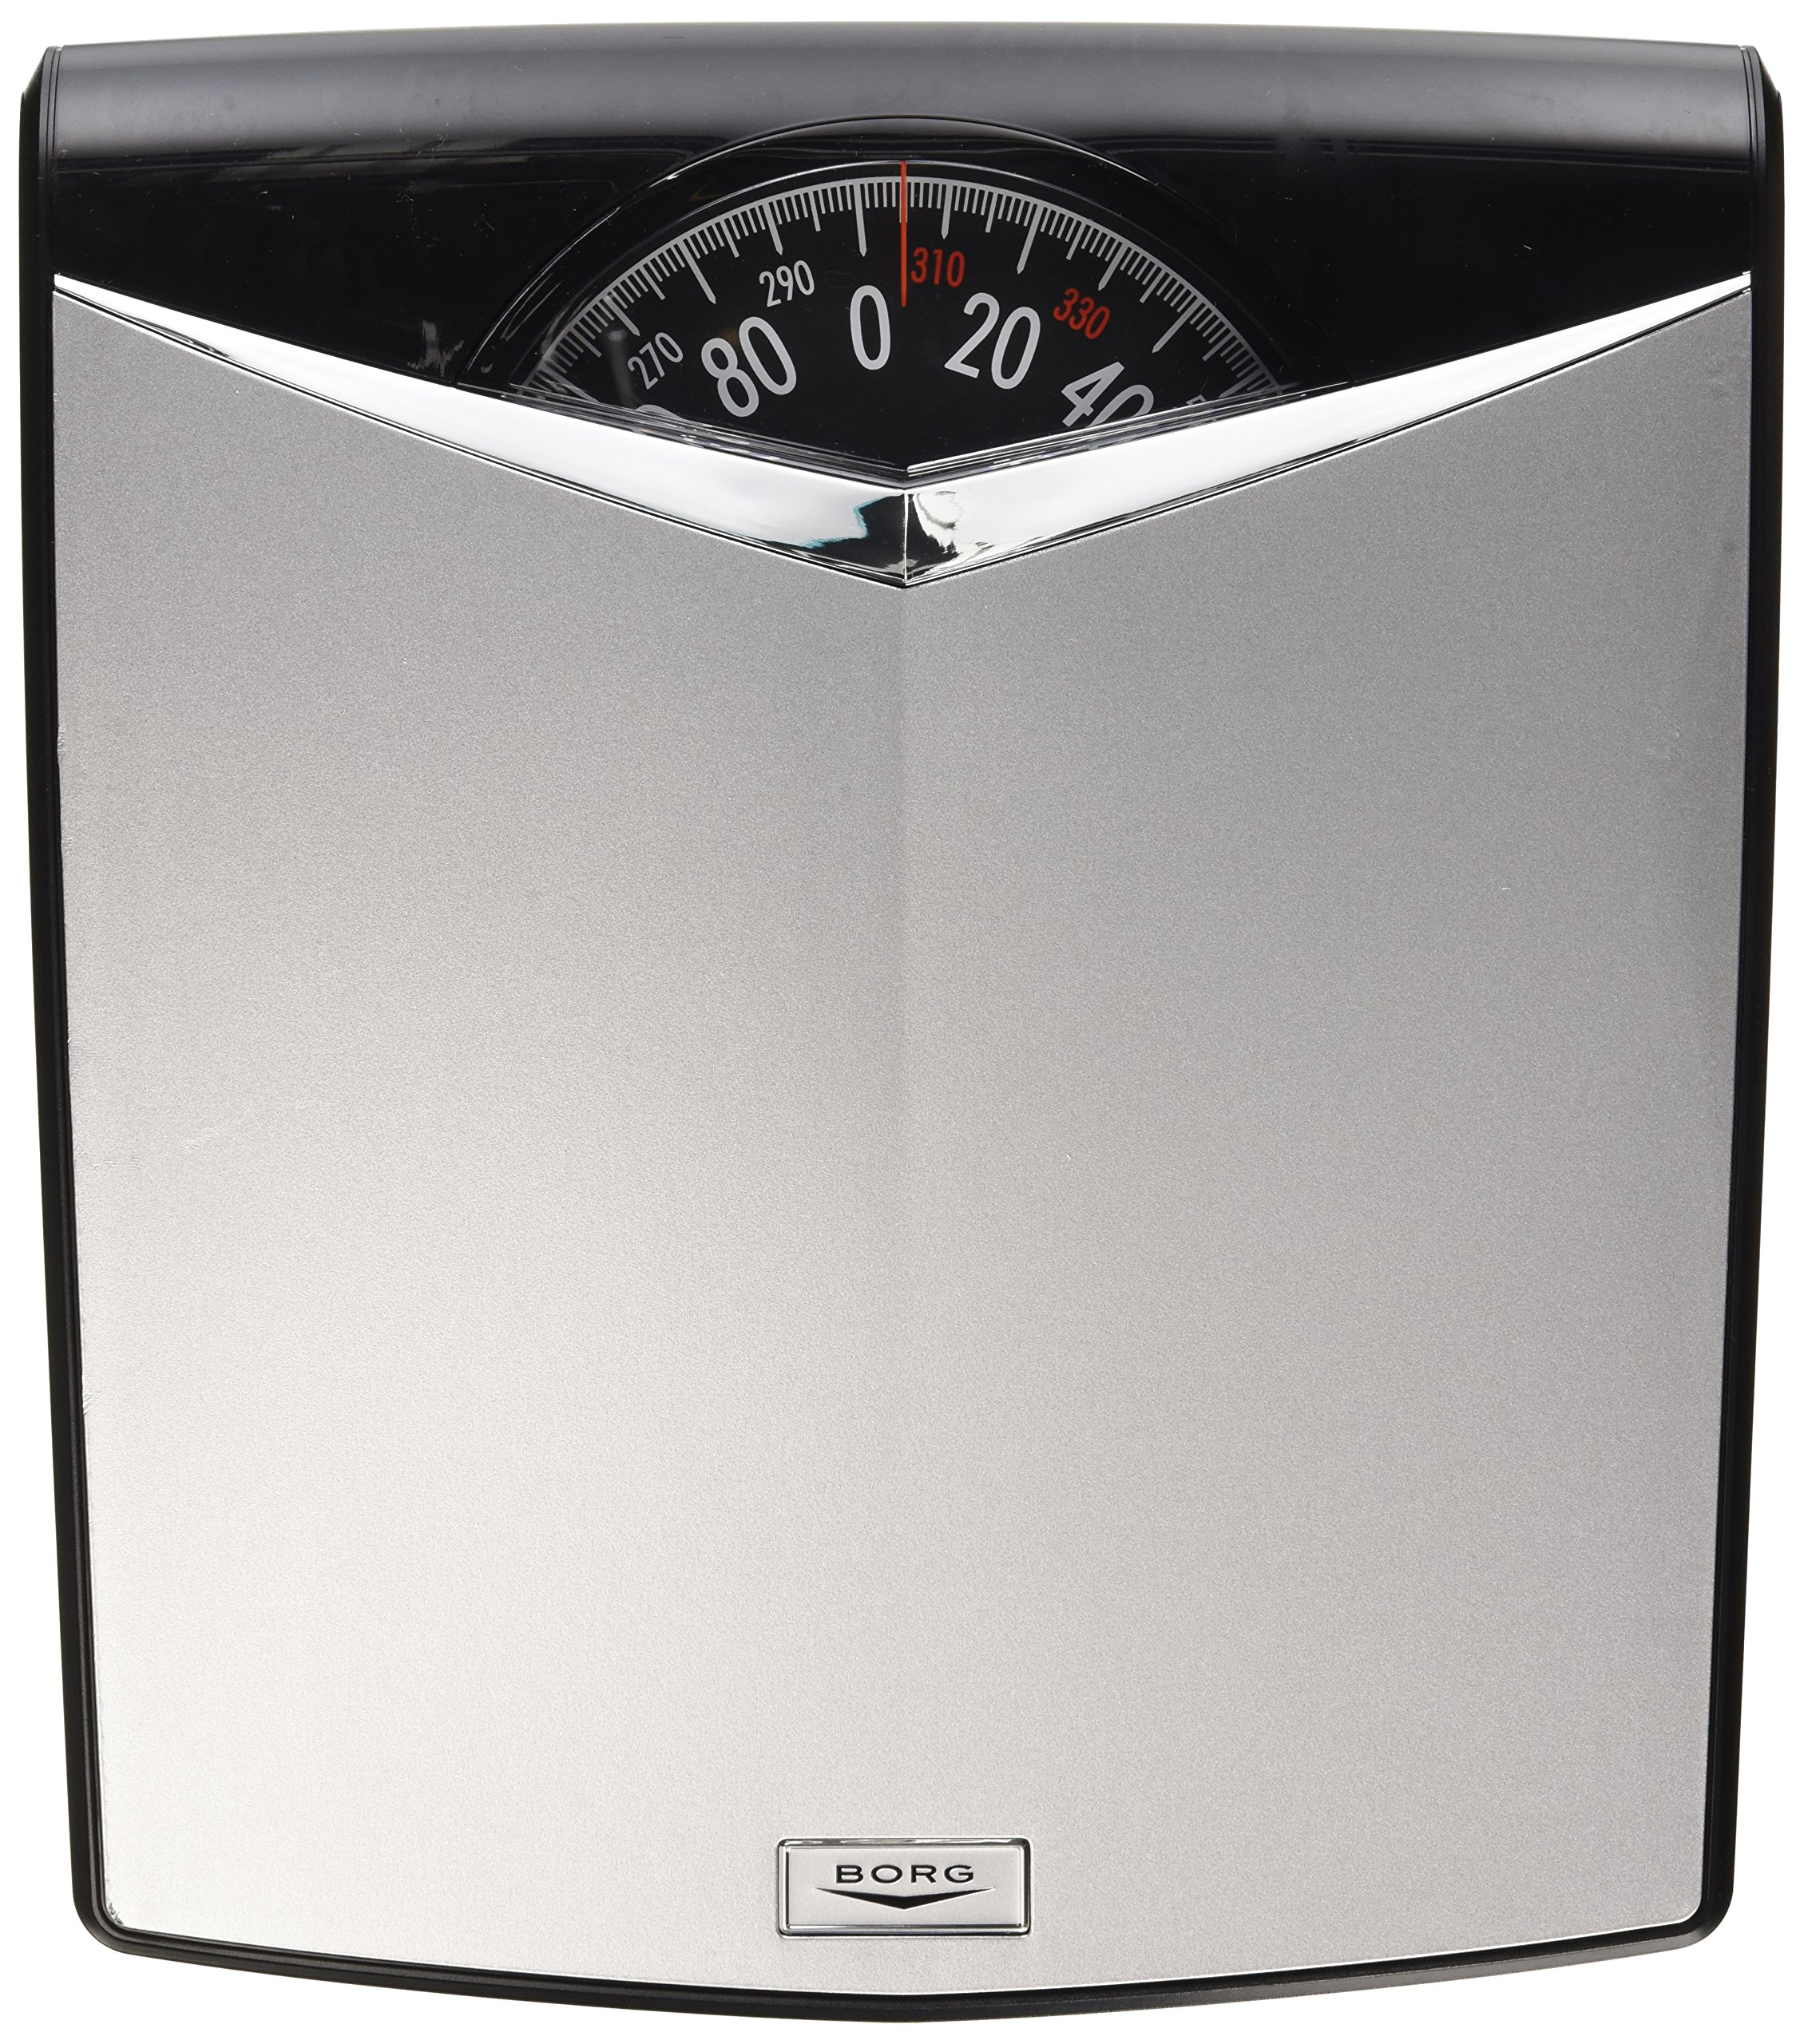 Borg High-Accuracy Modern Dial Scale, Silver